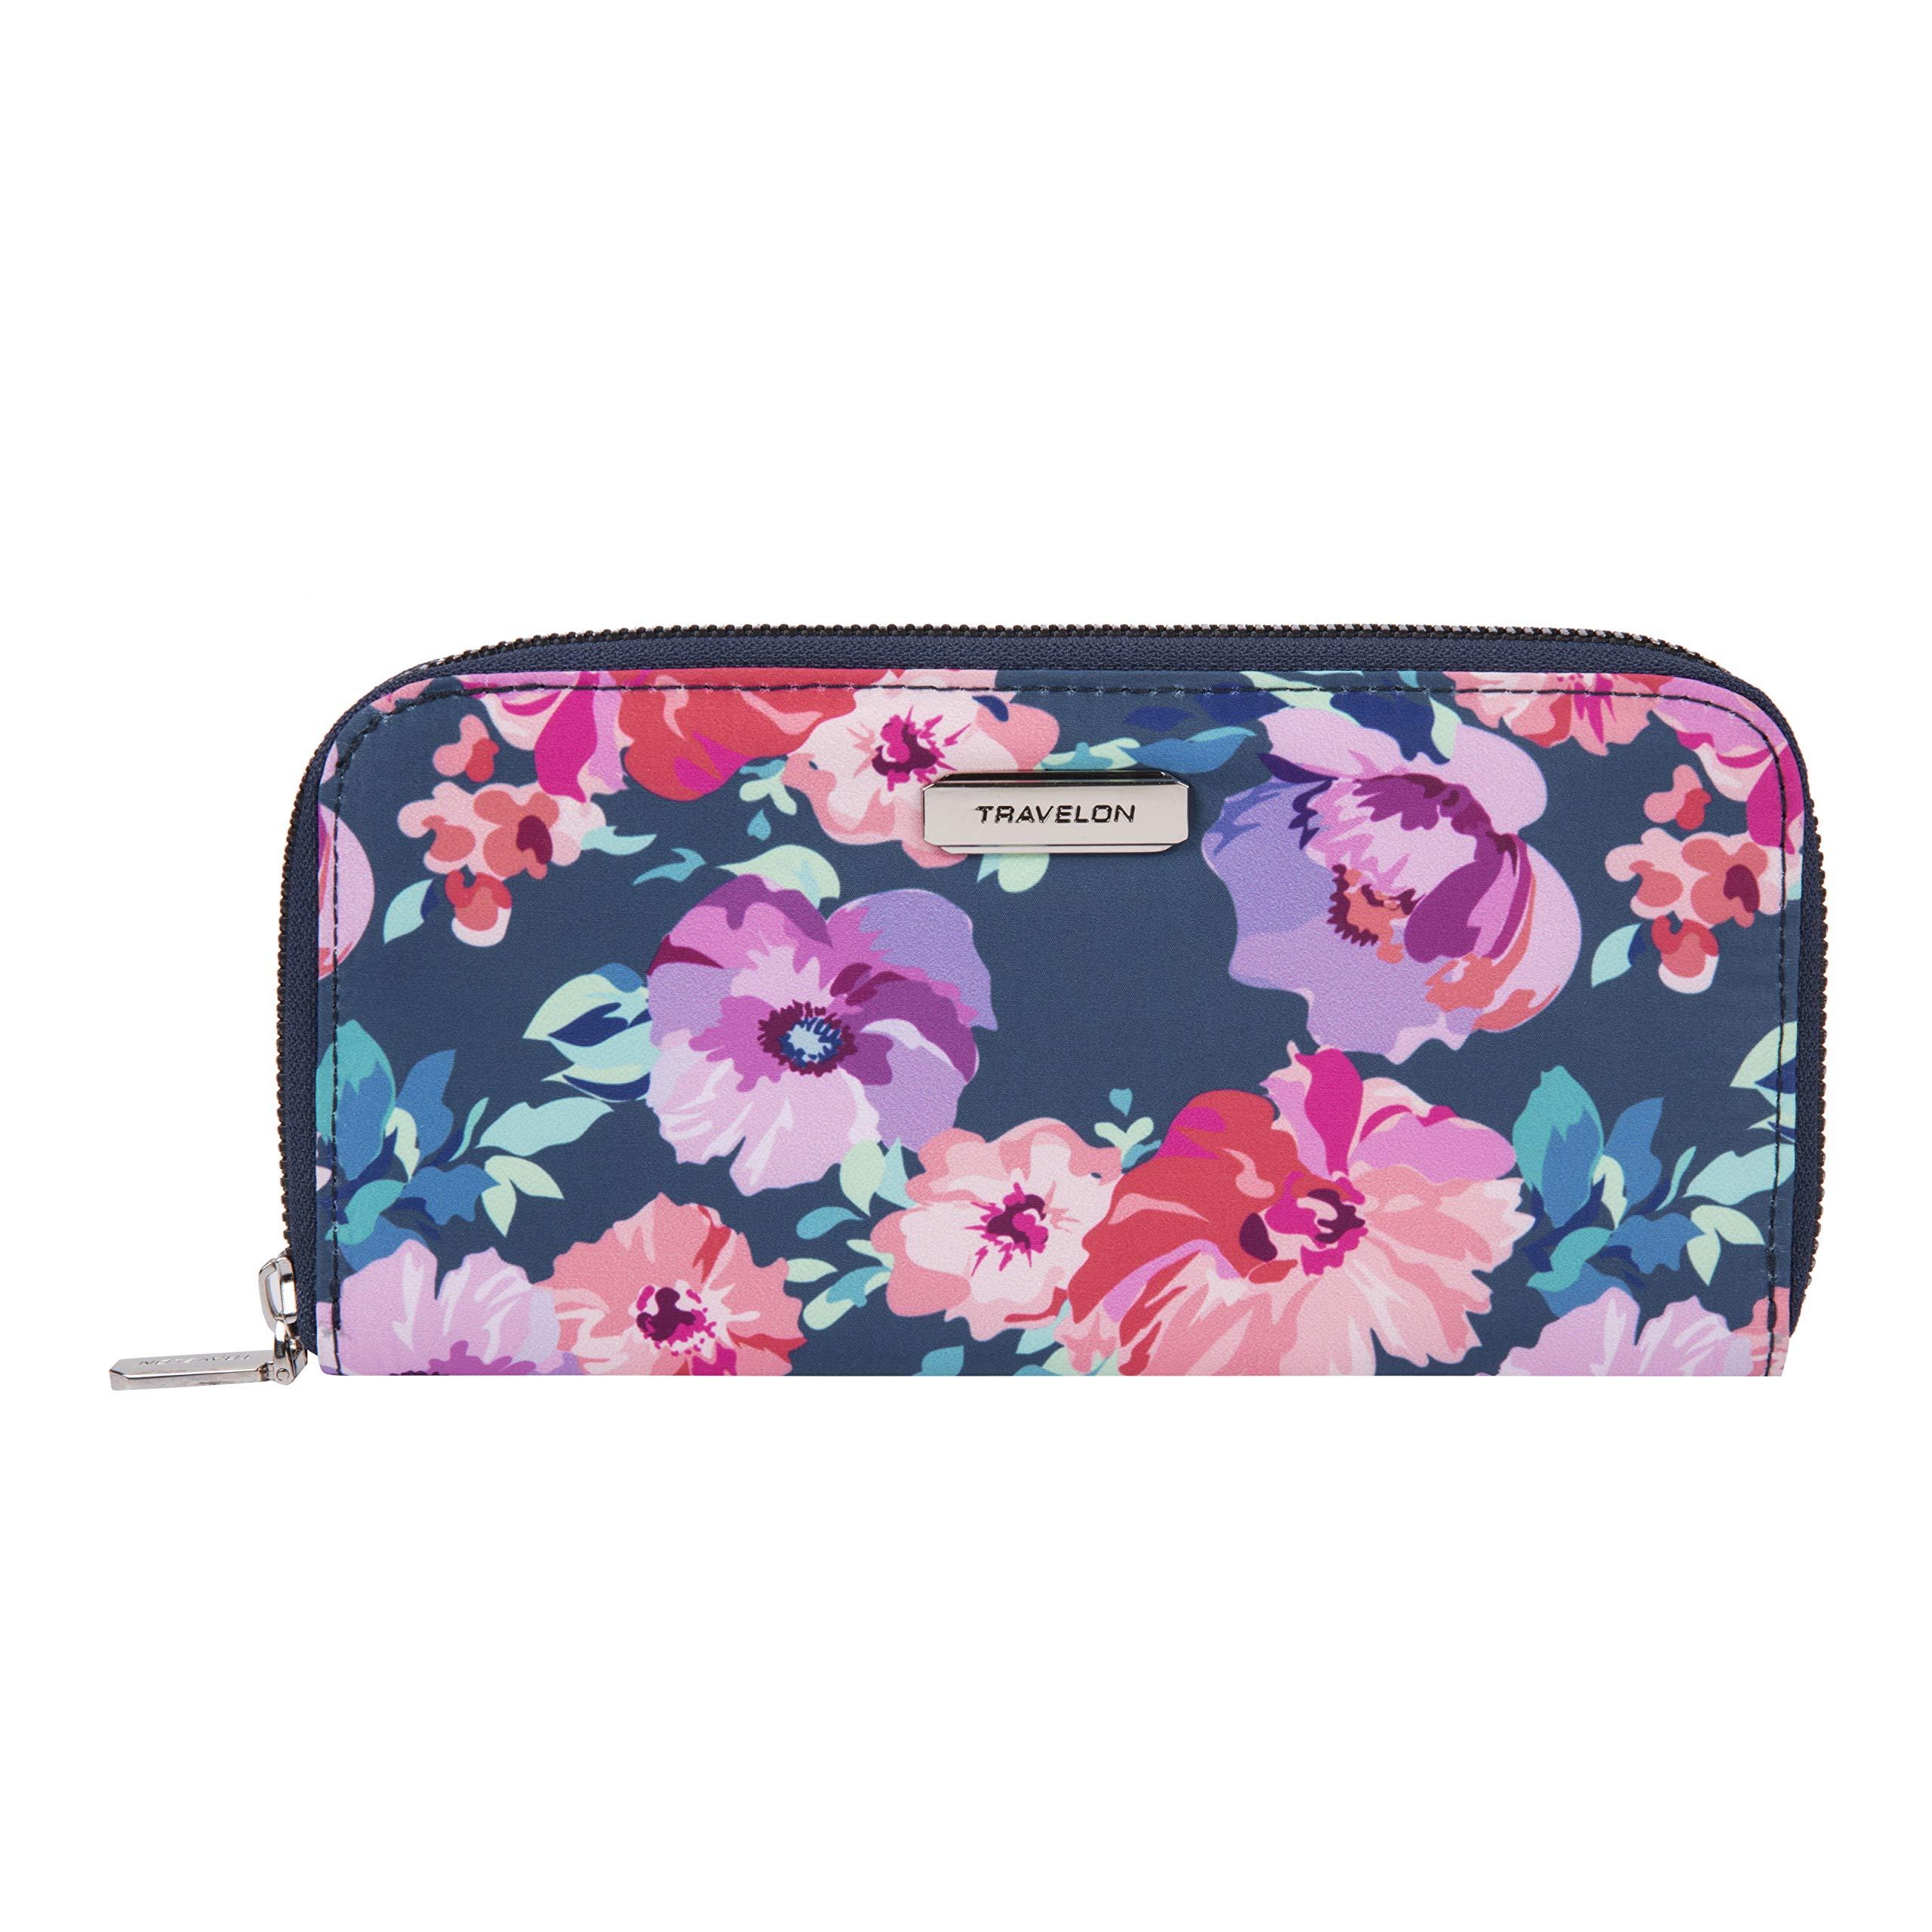 Travelon RFID Blocking Single Zip Wallet, blossom Floral by Travelon